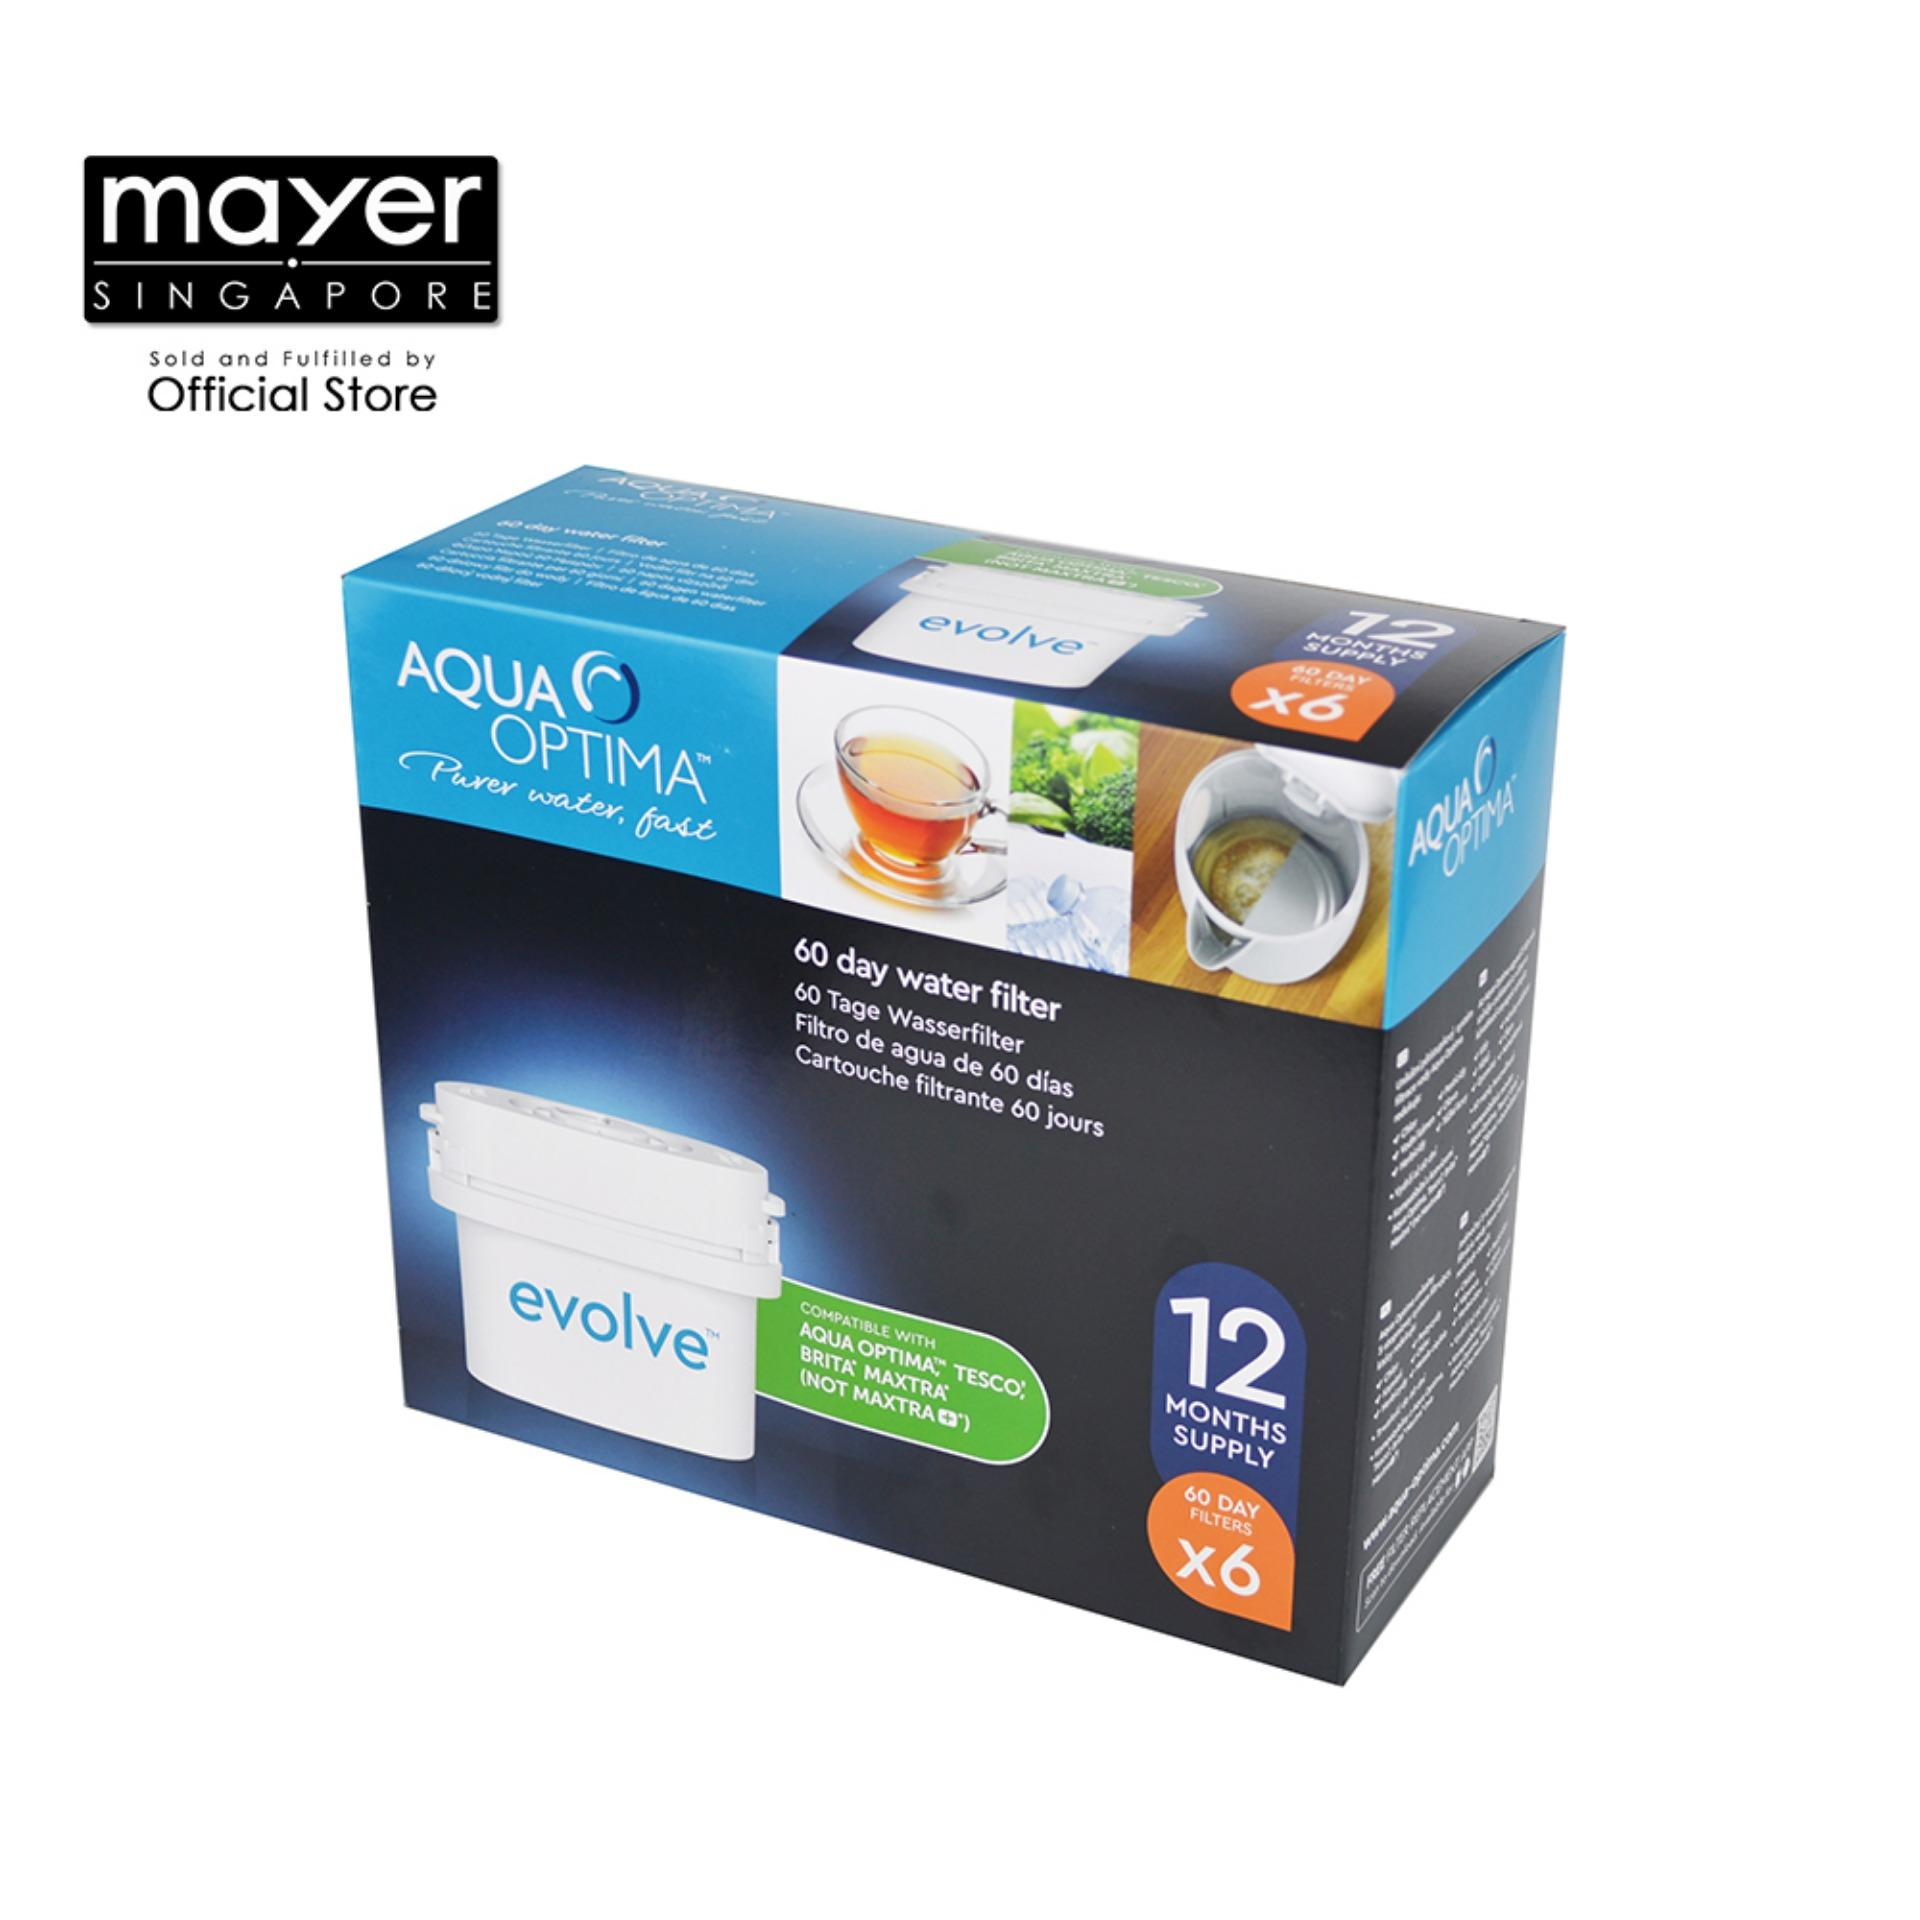 Aqua Optima Evd602 Evolve Water Filter Pack Of 6 By Mayer Marketing Pte Ltd.